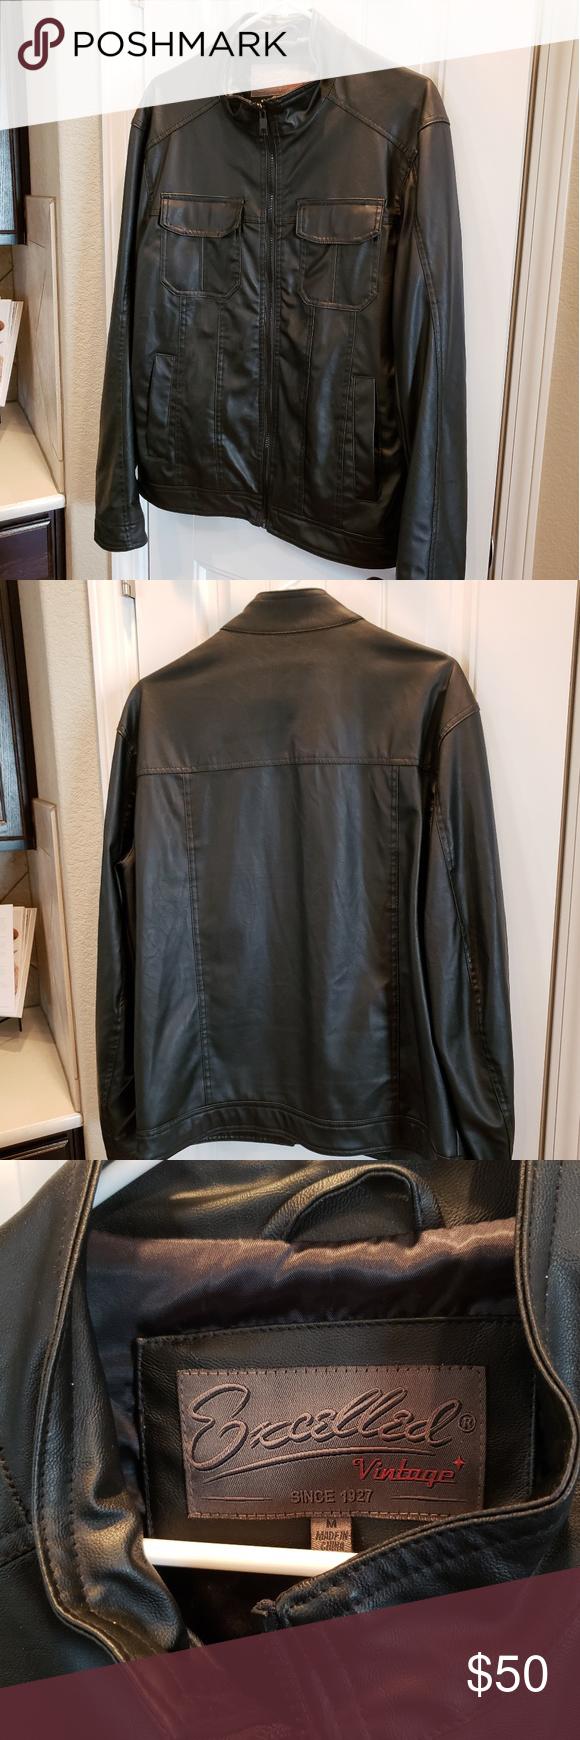 Excelled Jacket Mens Size M Mens Jackets Jackets Vintage Branding [ 1740 x 580 Pixel ]